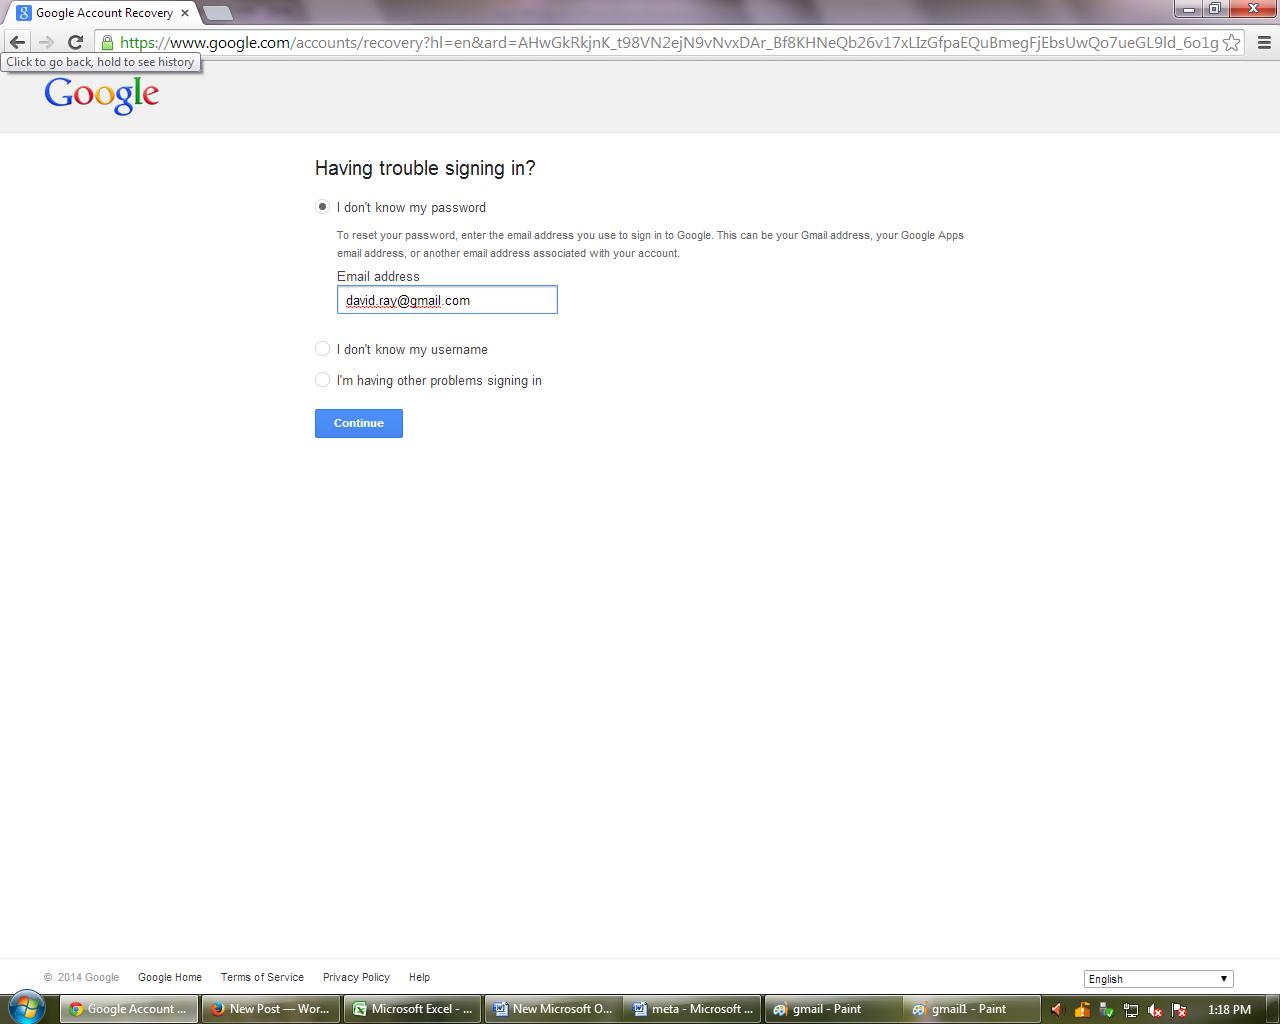 update gmail password